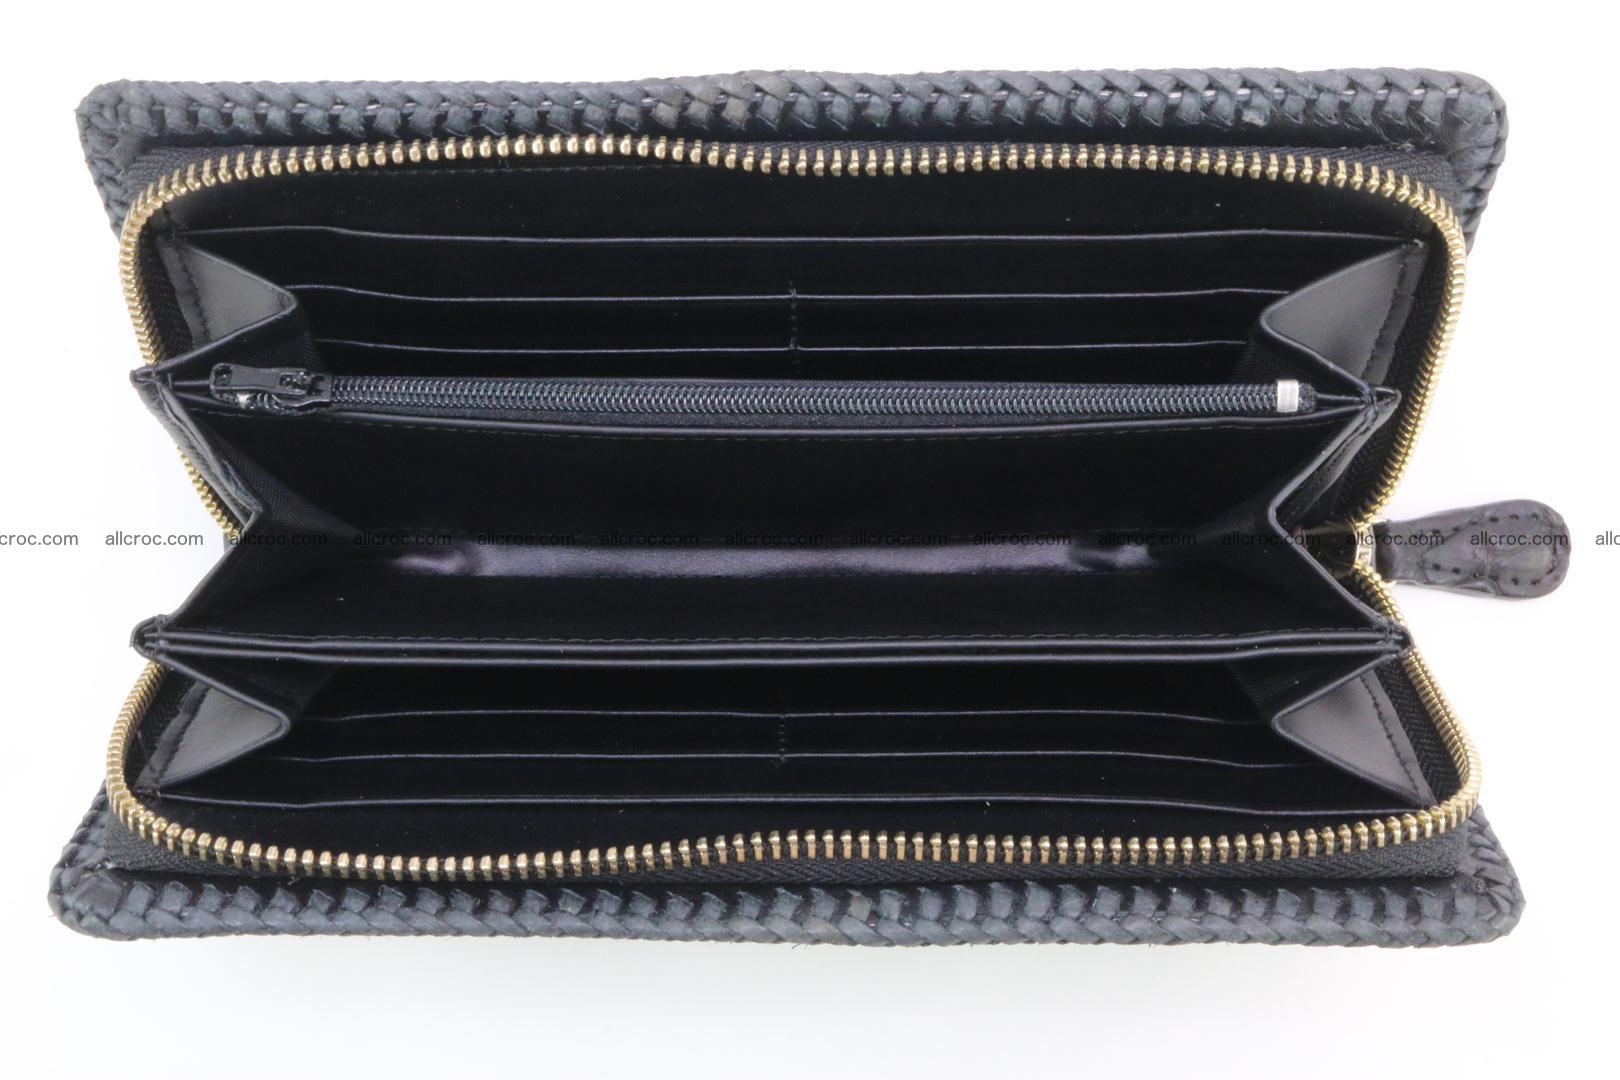 Genuine crocodile hornback wallet with zip 109 Foto 6